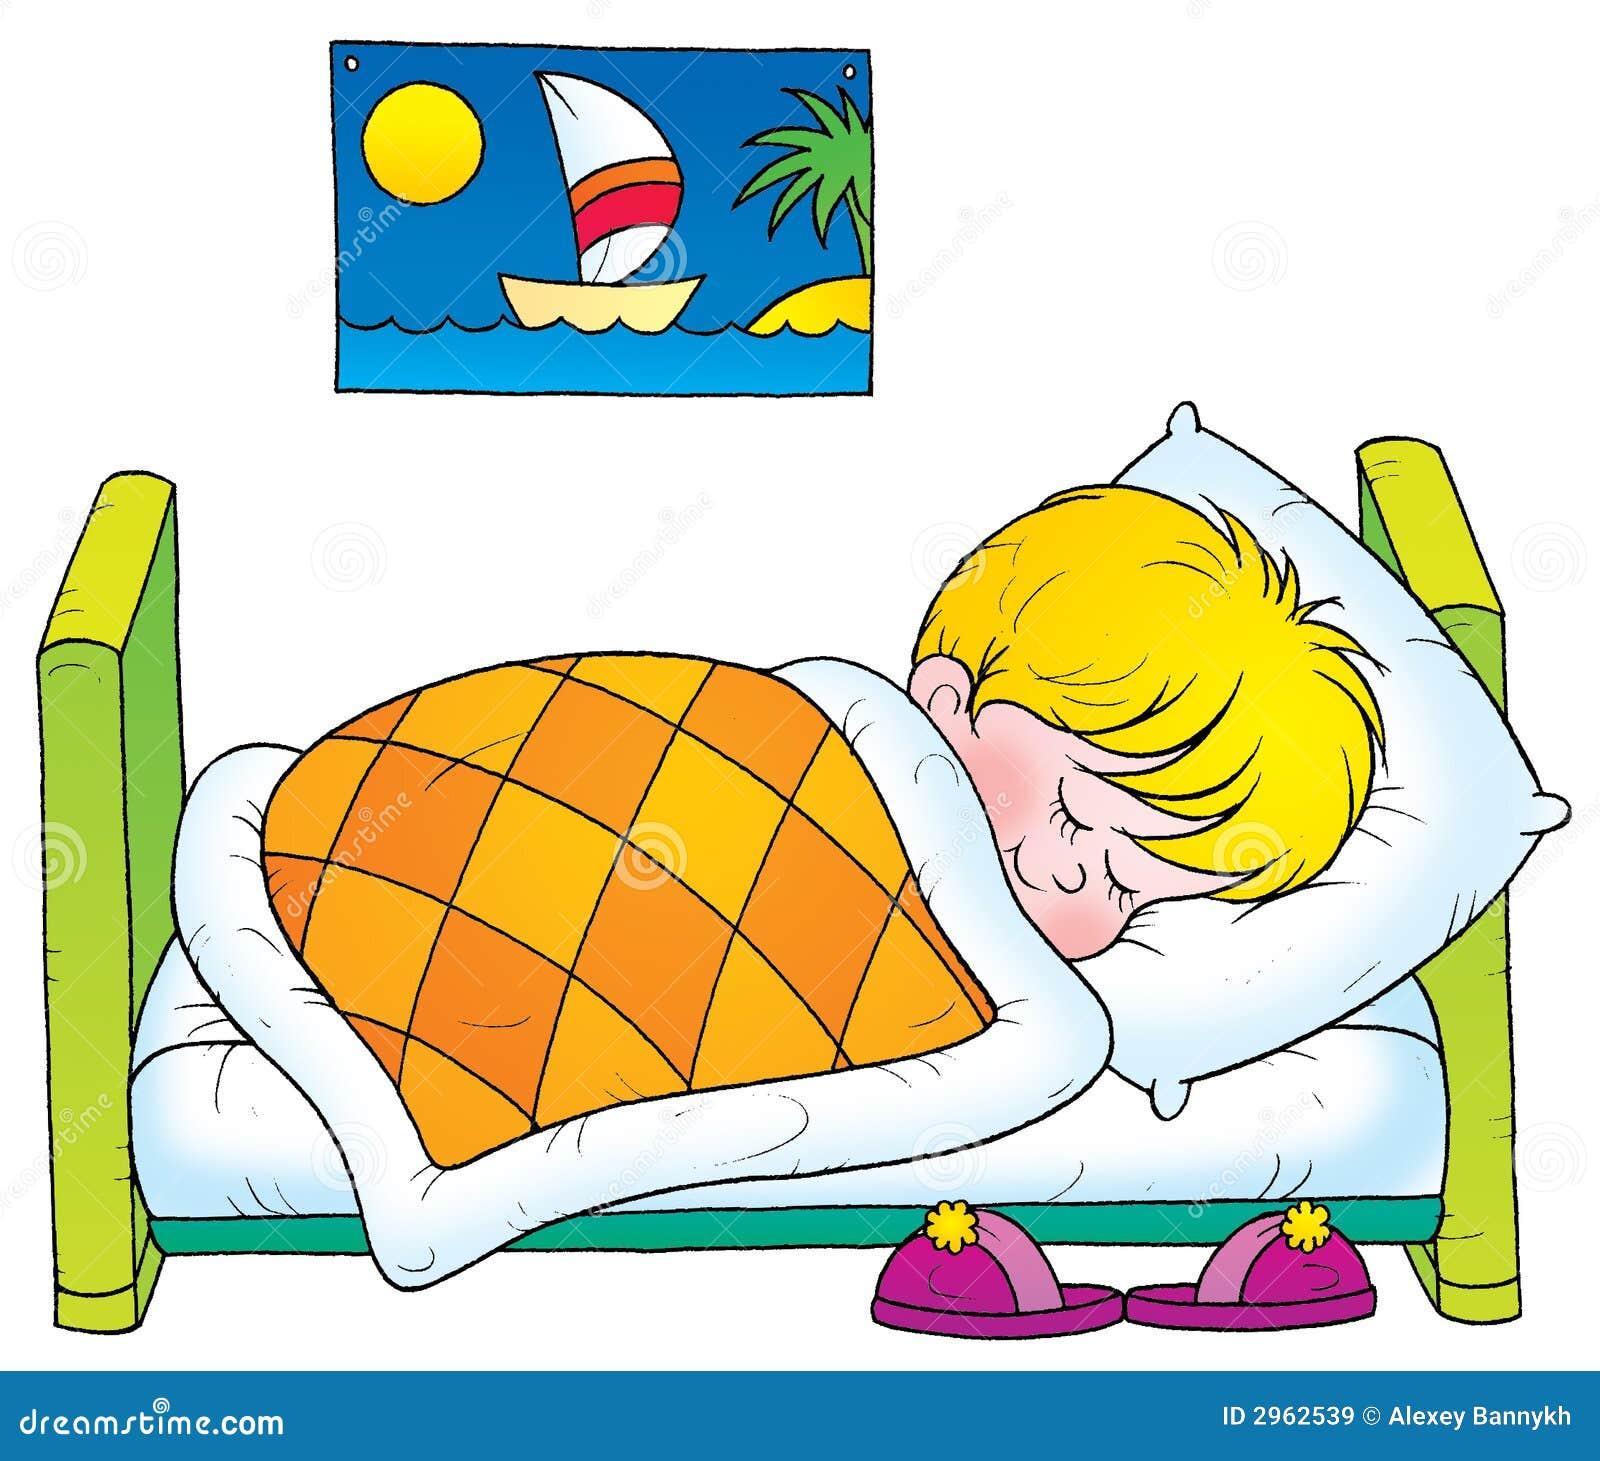 schlafen lizenzfreie stockbilder bild 2962539. Black Bedroom Furniture Sets. Home Design Ideas